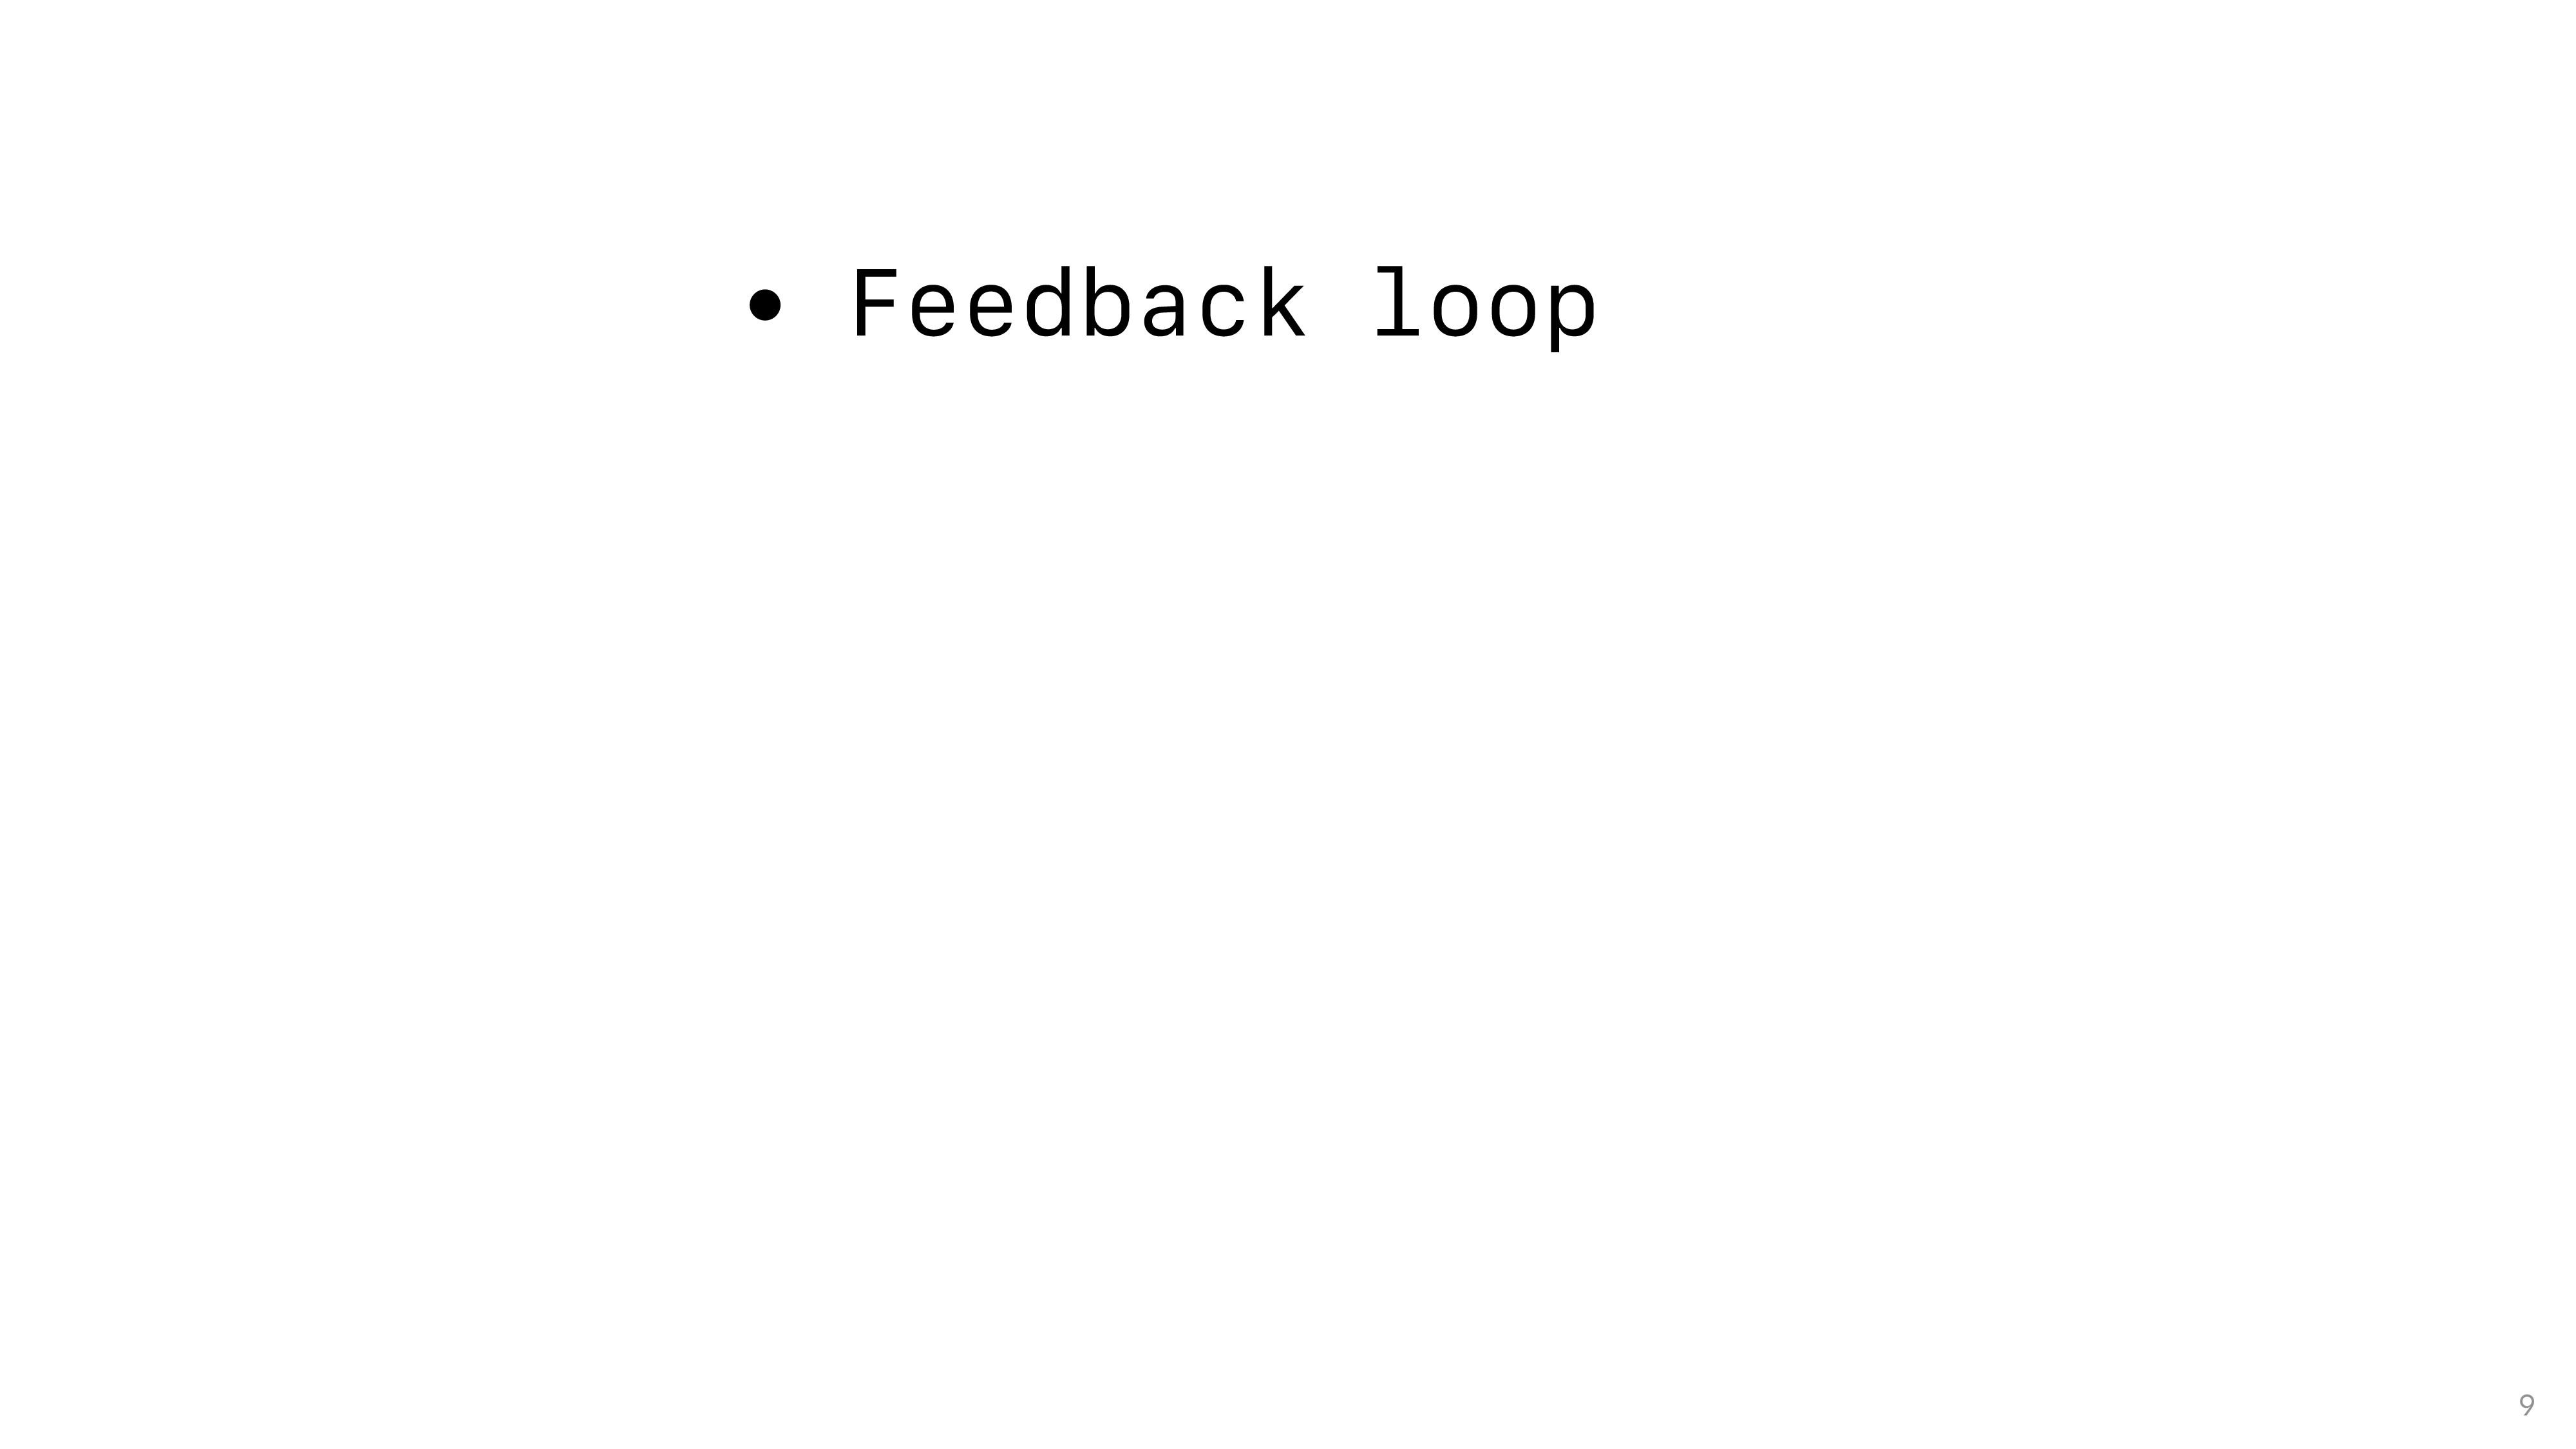 9 • Feedback loop